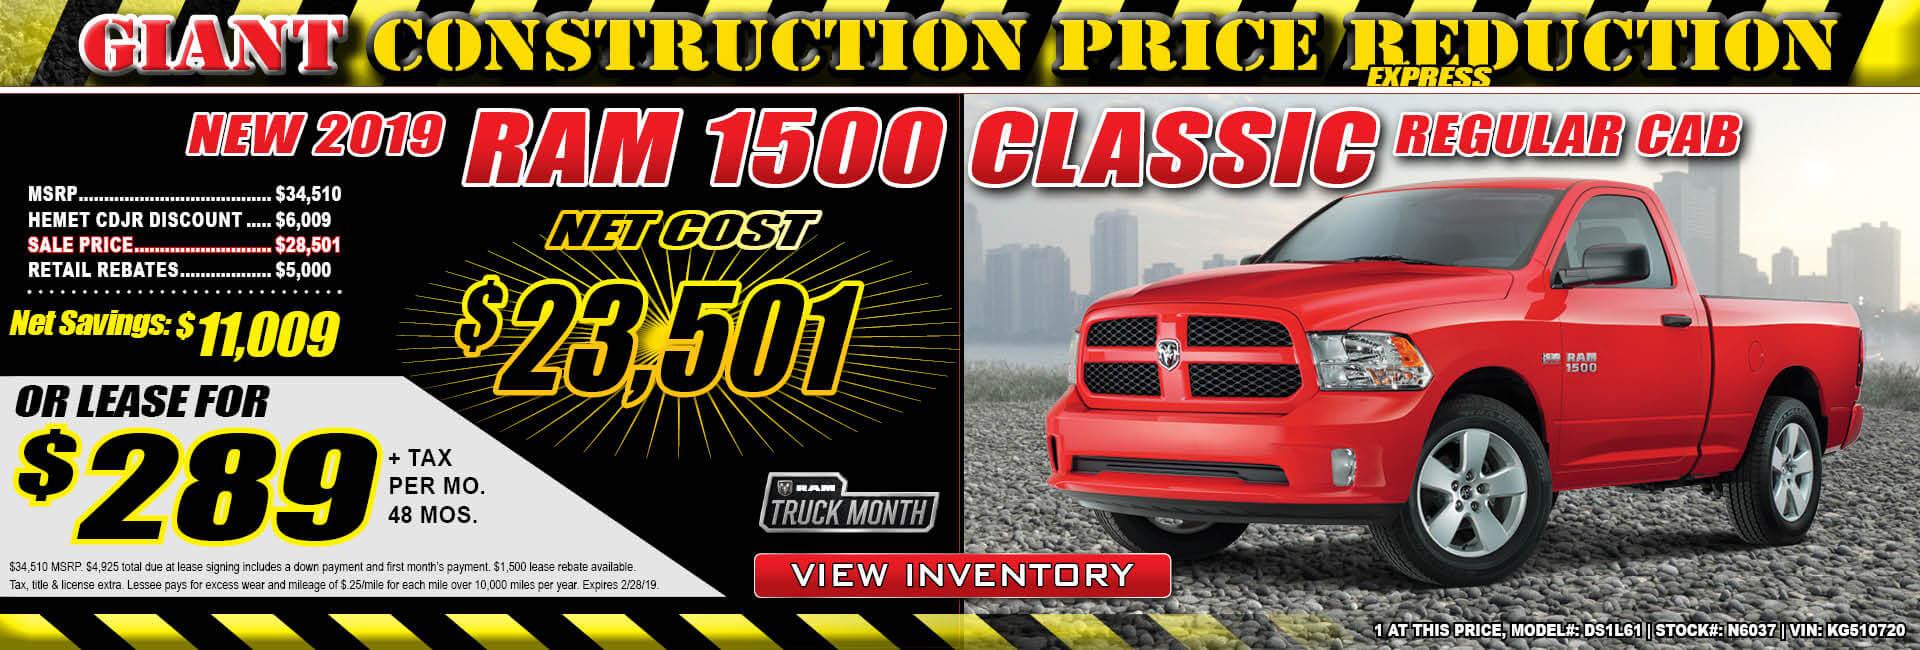 Ram 1500 Lease $289